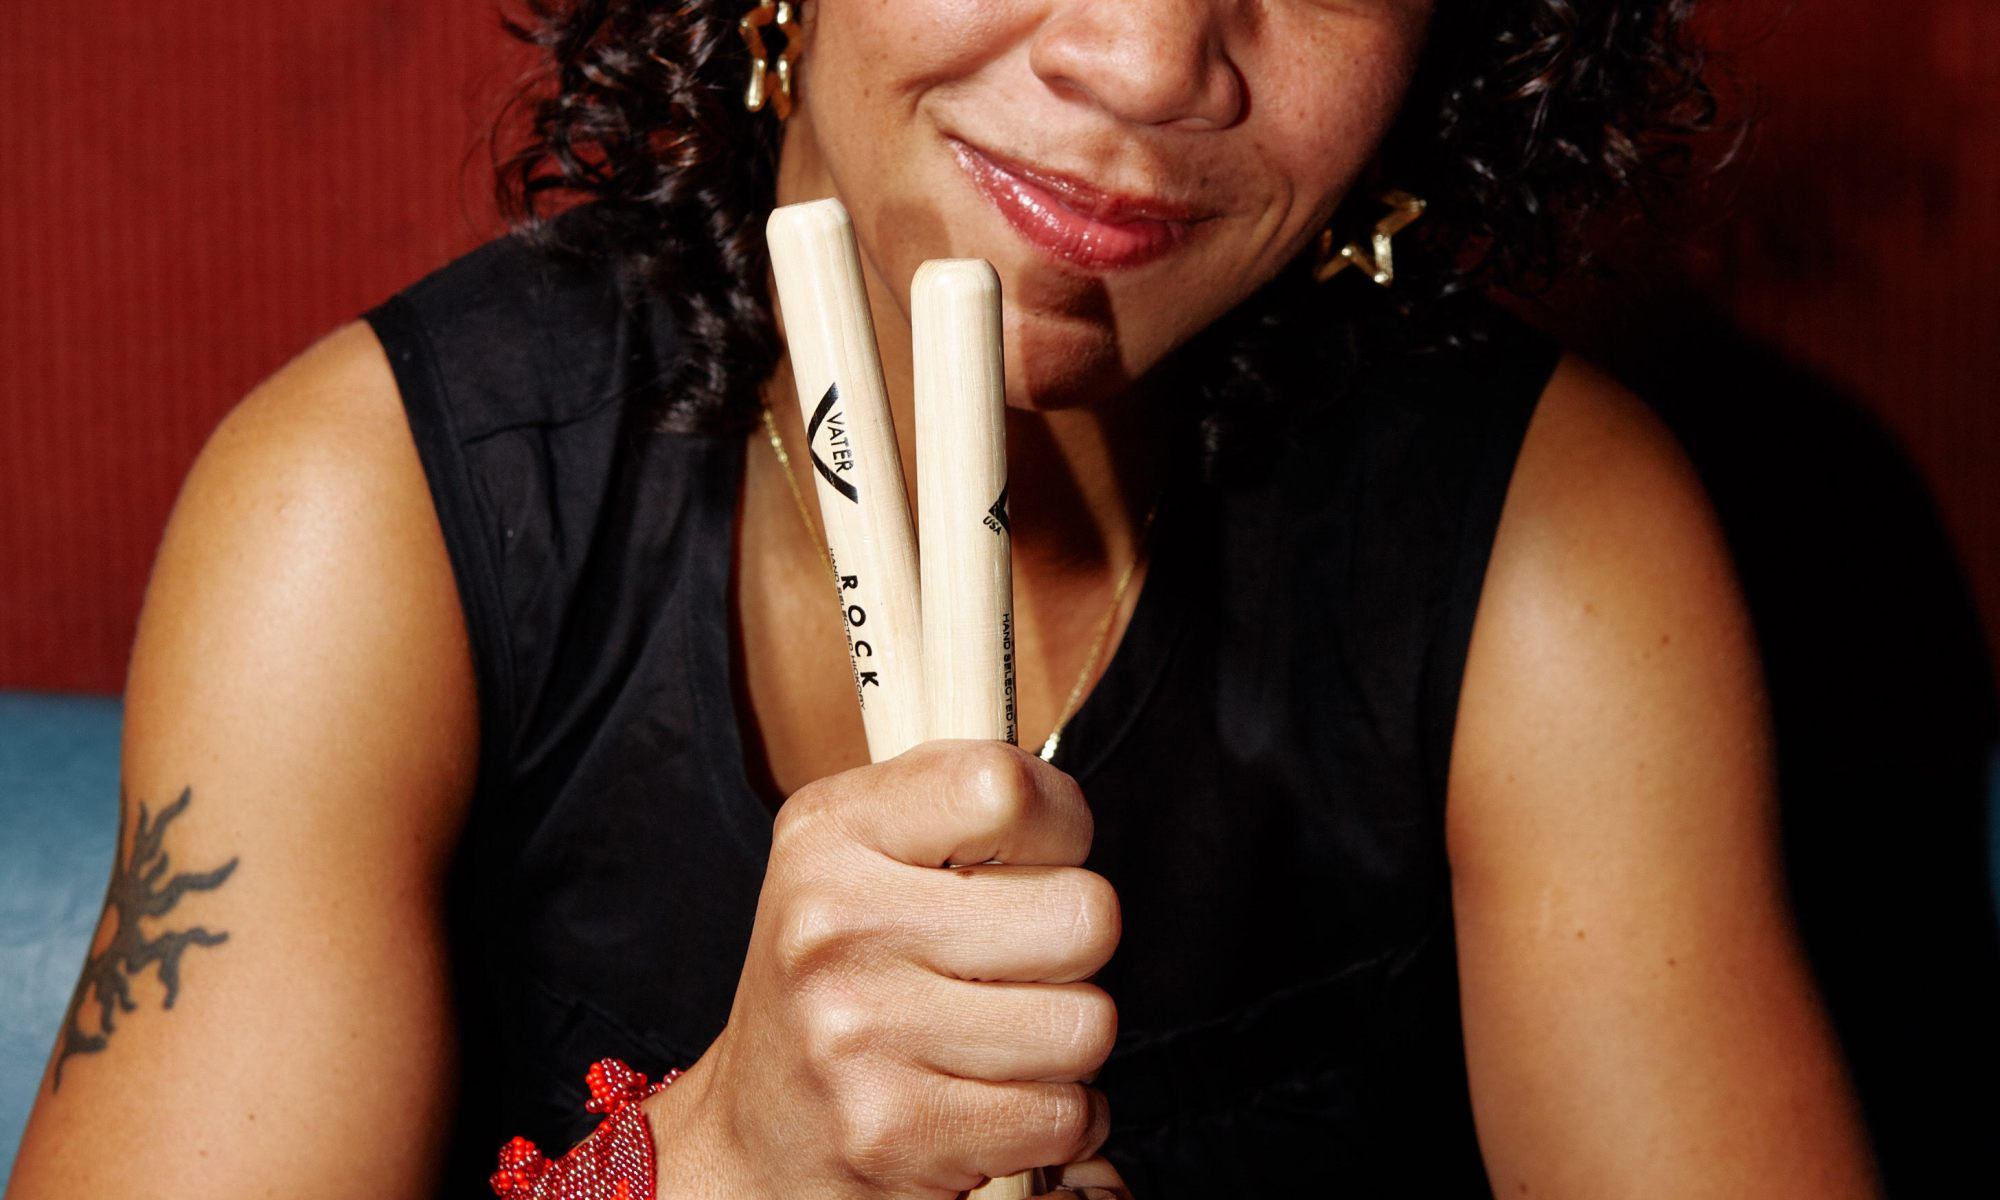 LaFrae Sci : composer, drummer and educator